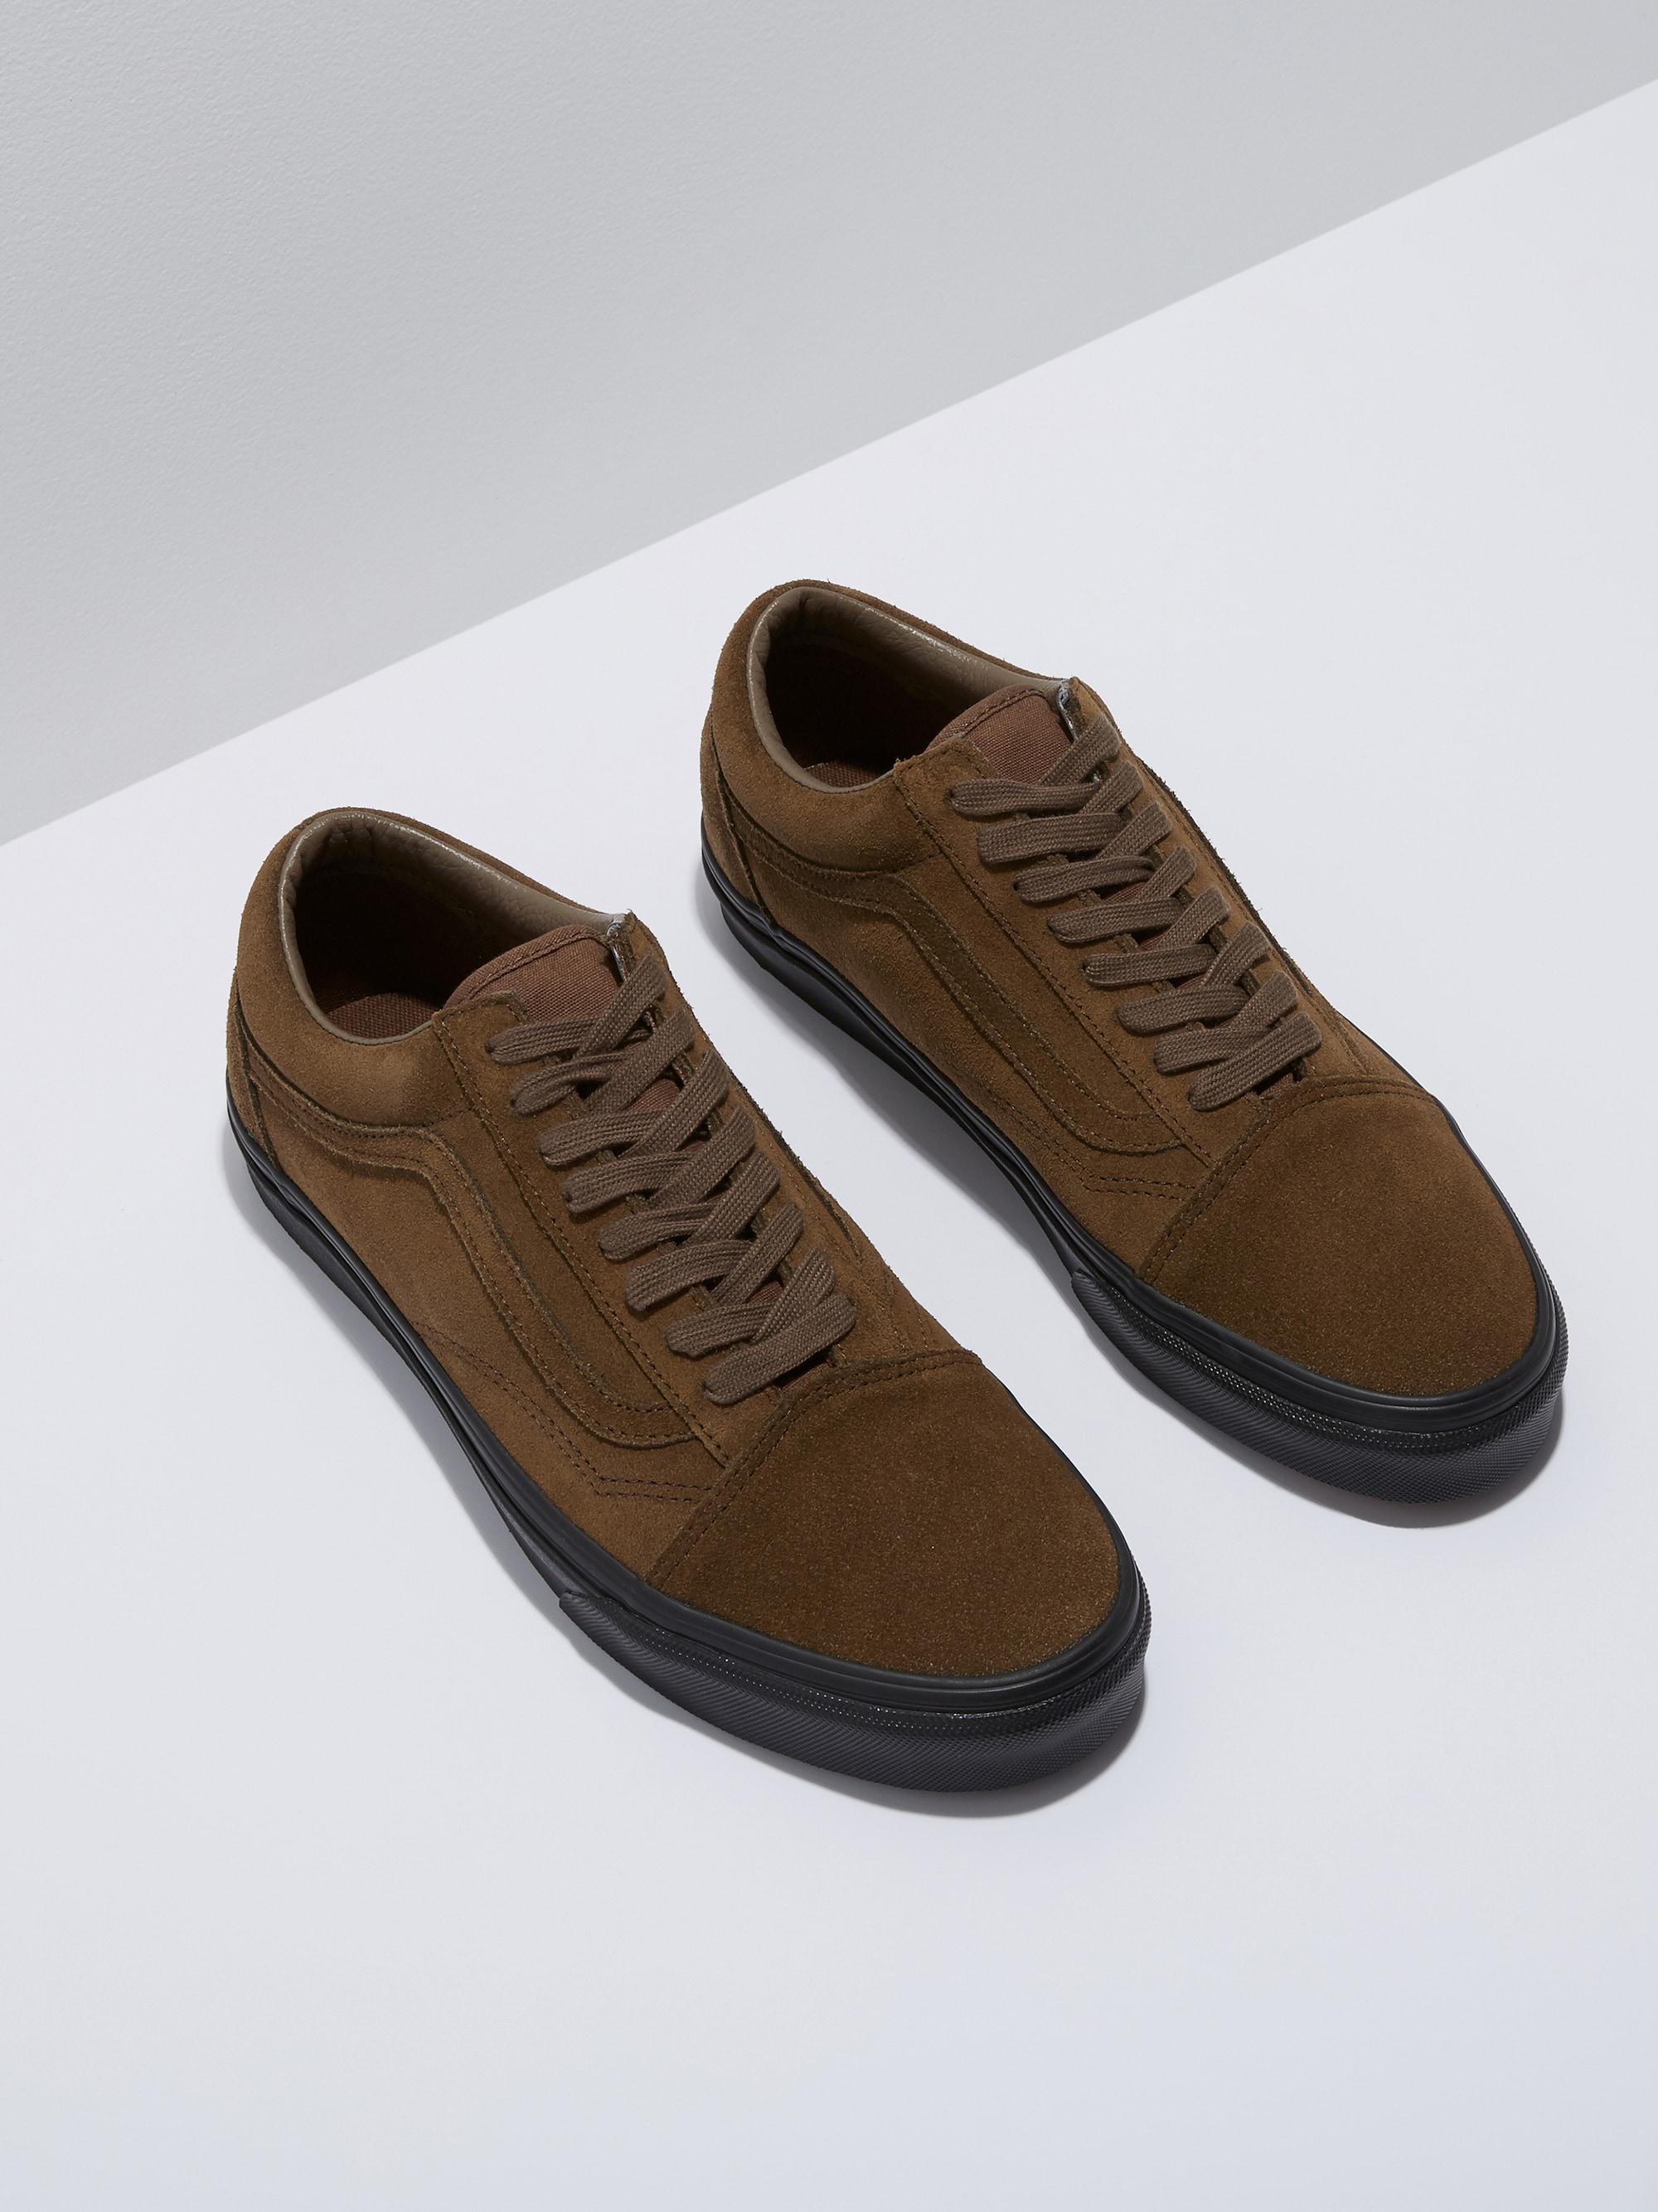 d5a39d6c00e Lyst - Frank And Oak Vans Suede Old Skool In Teak in Brown for Men